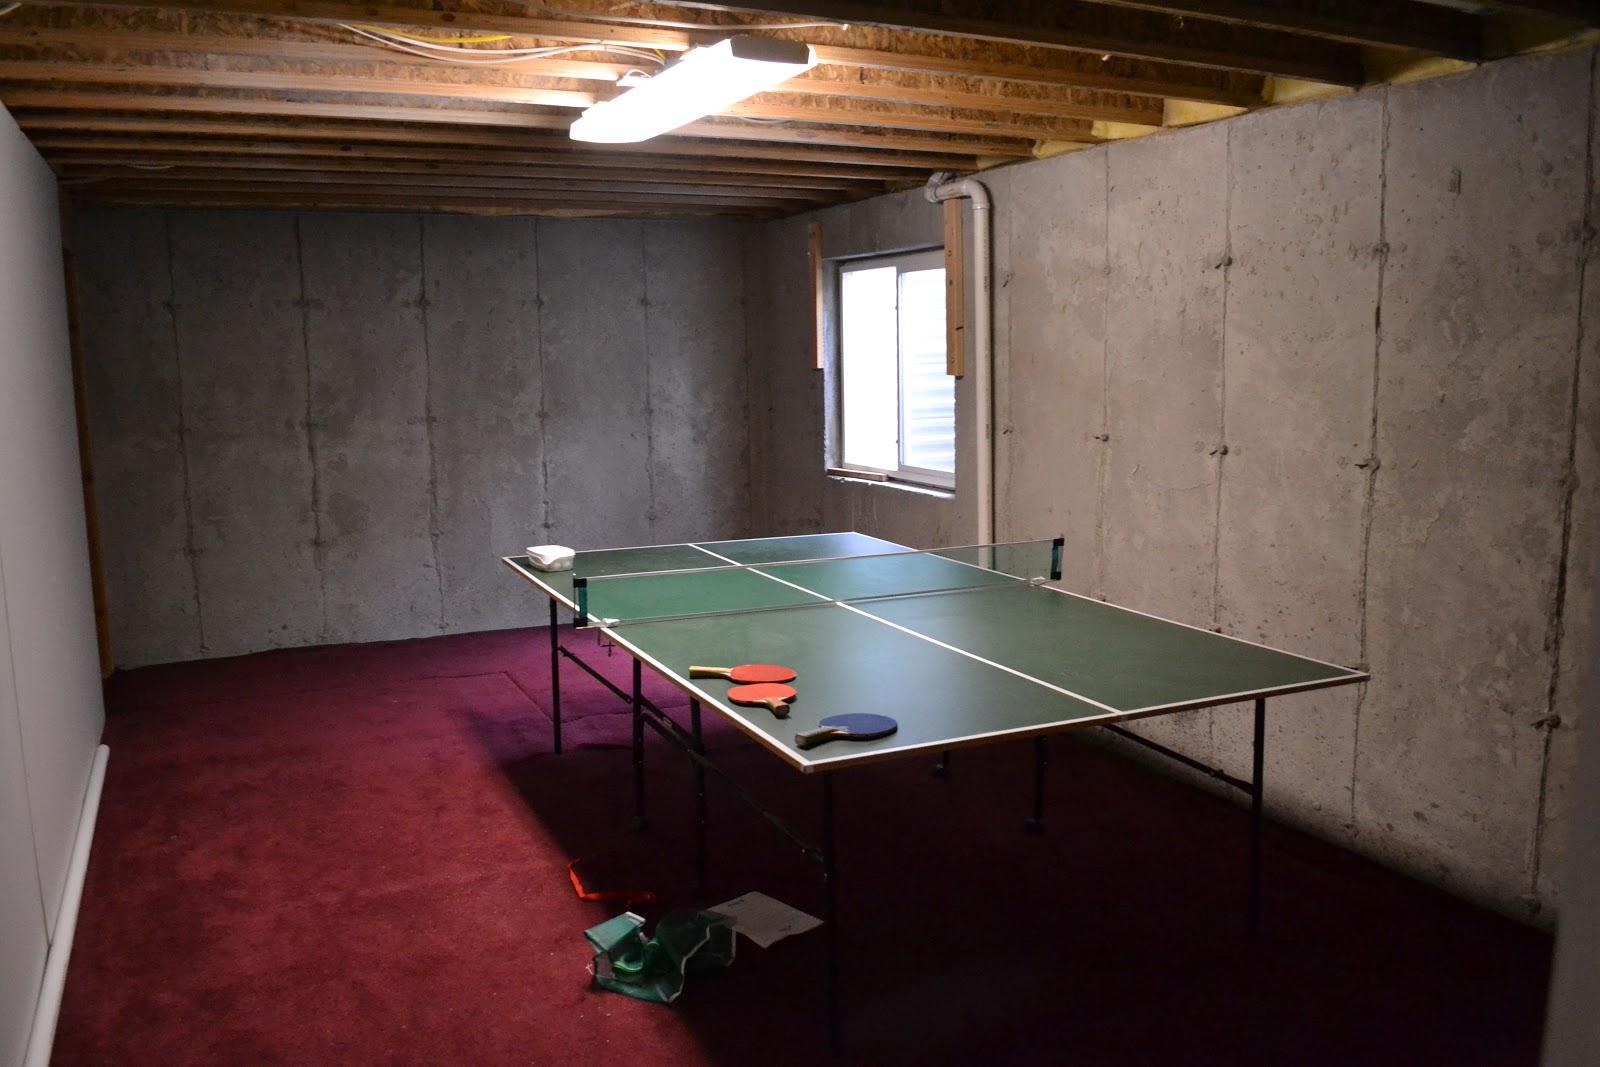 Unfinished basement storage ideas - Wall Unfinished Basement Ceiling Ideas Inspiring Ununfinished Pinterest C